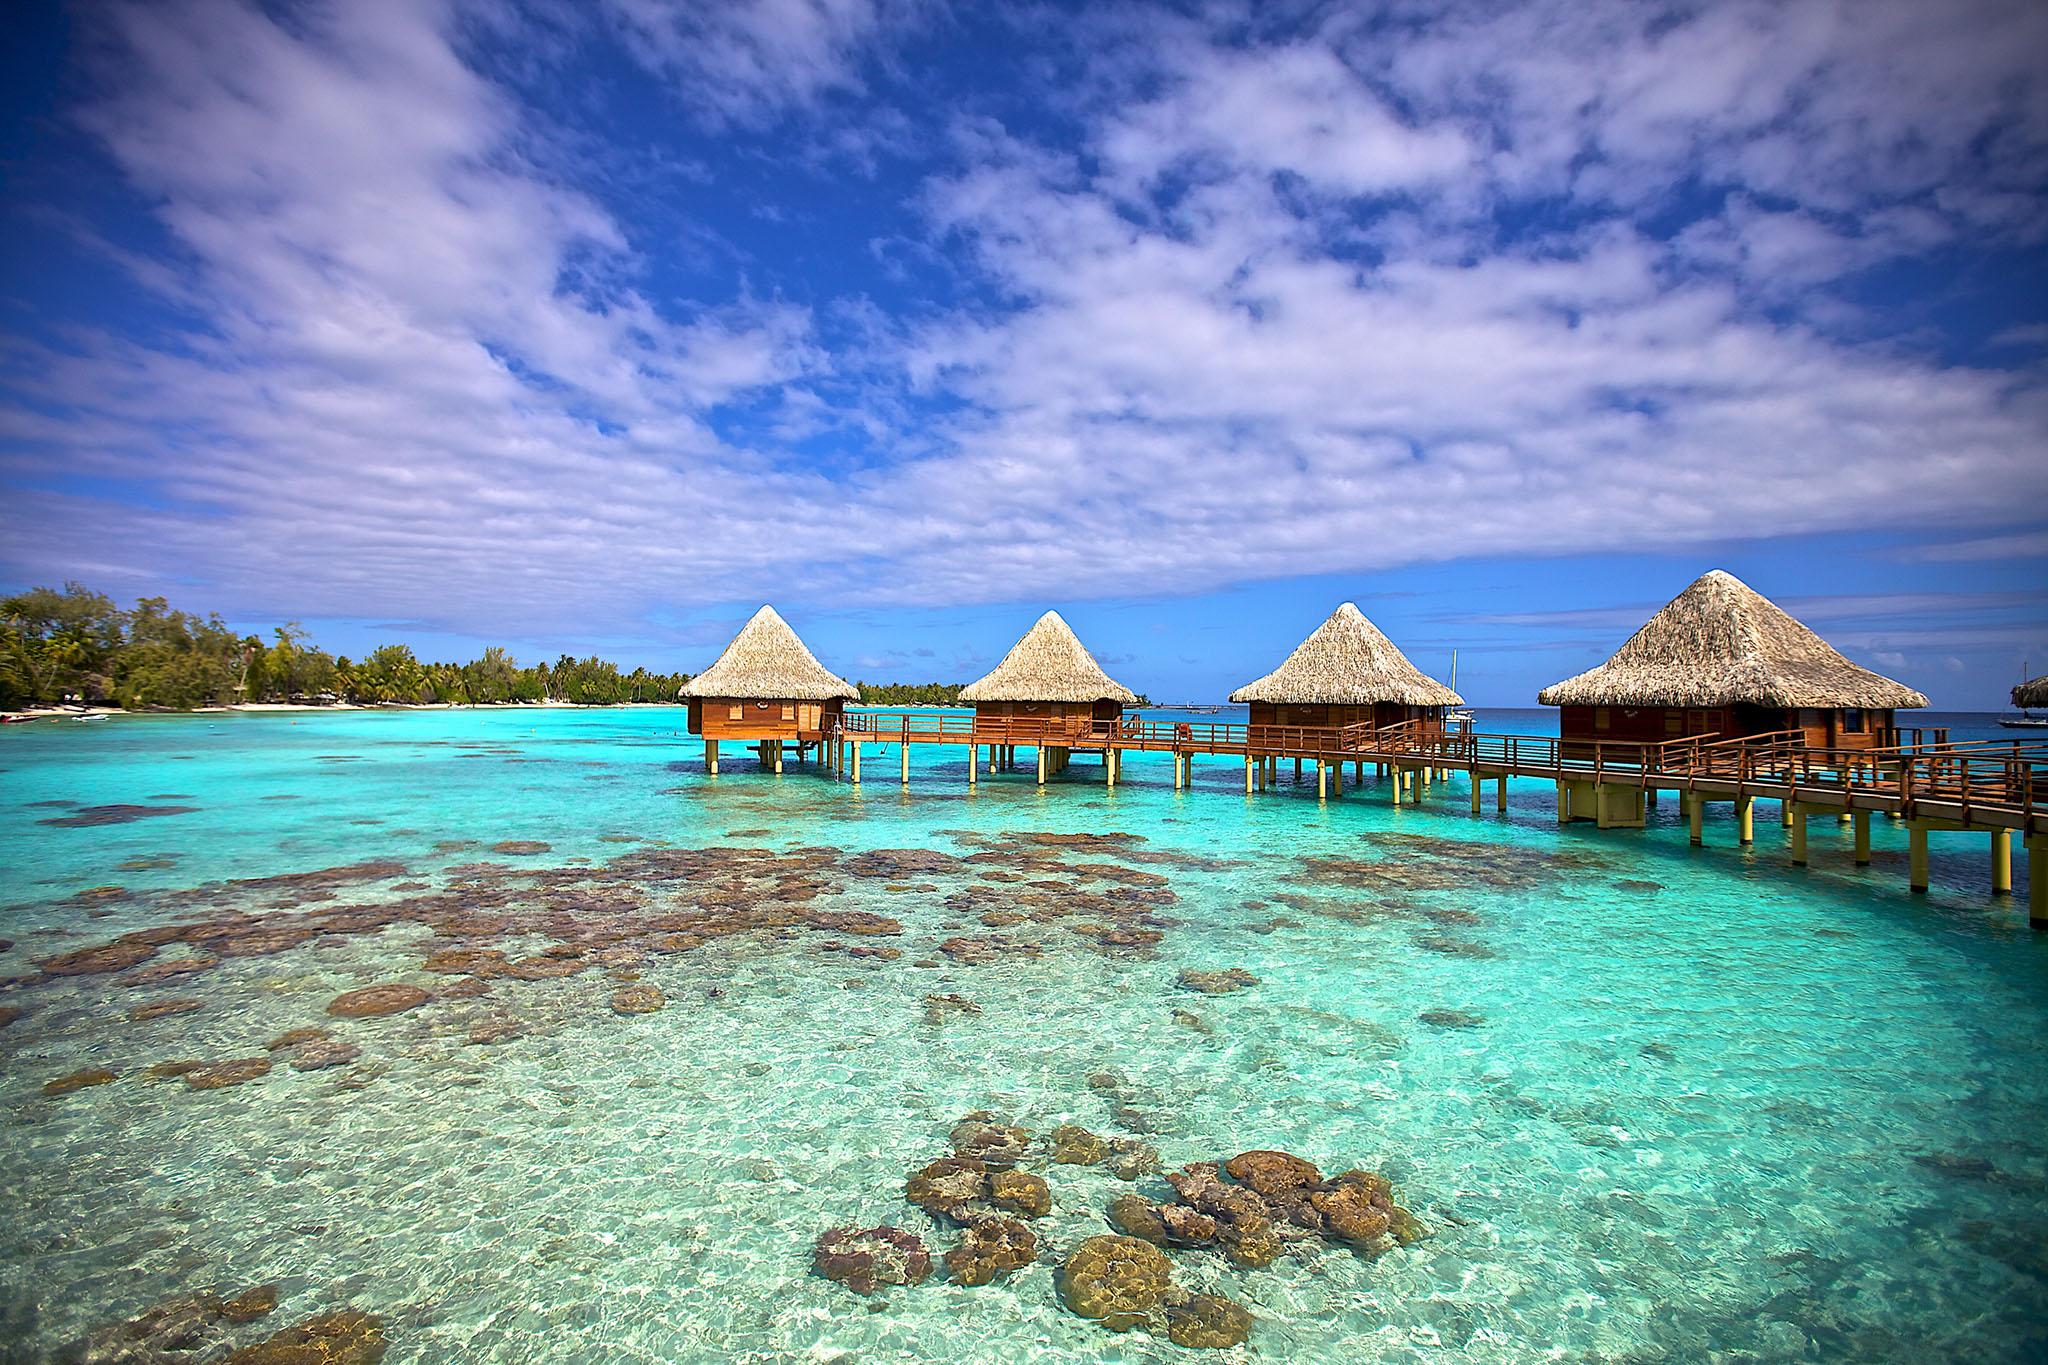 https://tahititourisme.com.au/wp-content/uploads/2017/08/RGI-Kia-Ora-Overwater-Bungalows-Exterior-20.gallery_image.1.jpg